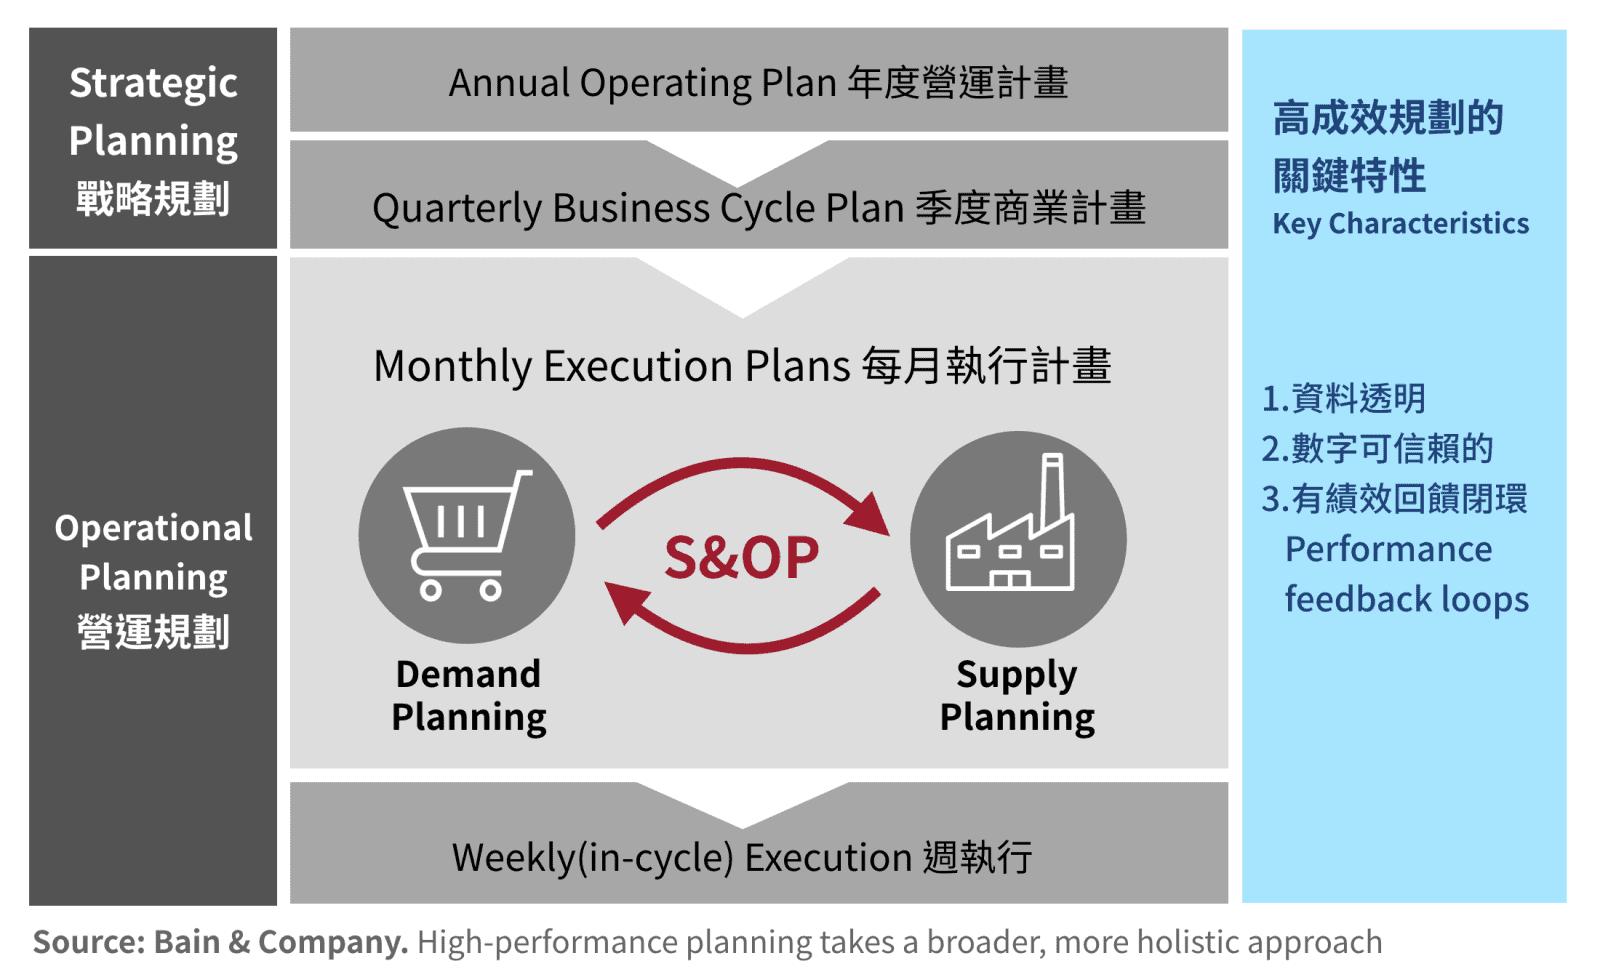 Sales and Operations Planning (S&OP) 是企業內部連接戰略發展與具體執行之間的關鍵橋梁